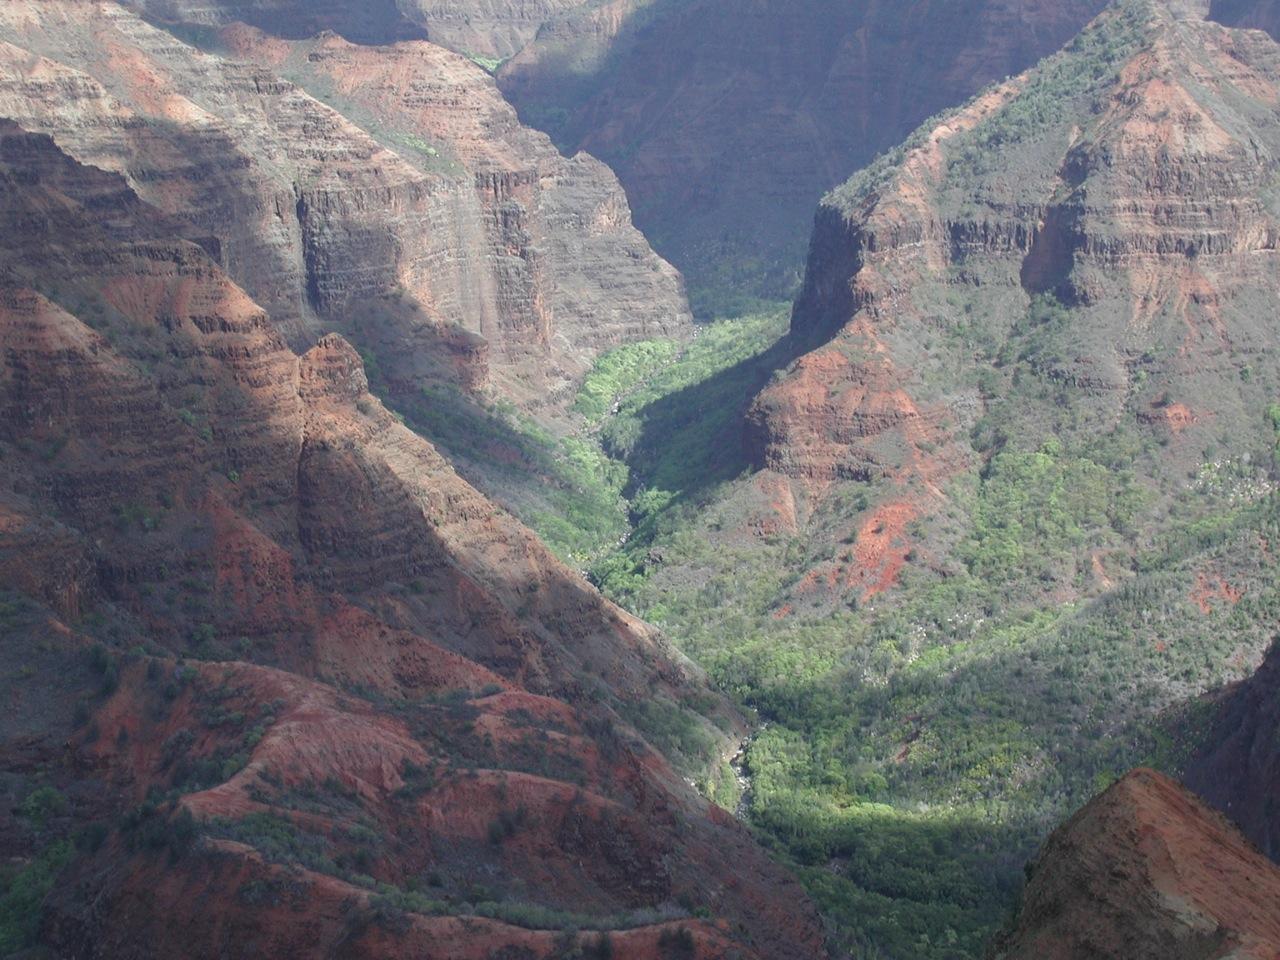 Valley in Hawaii